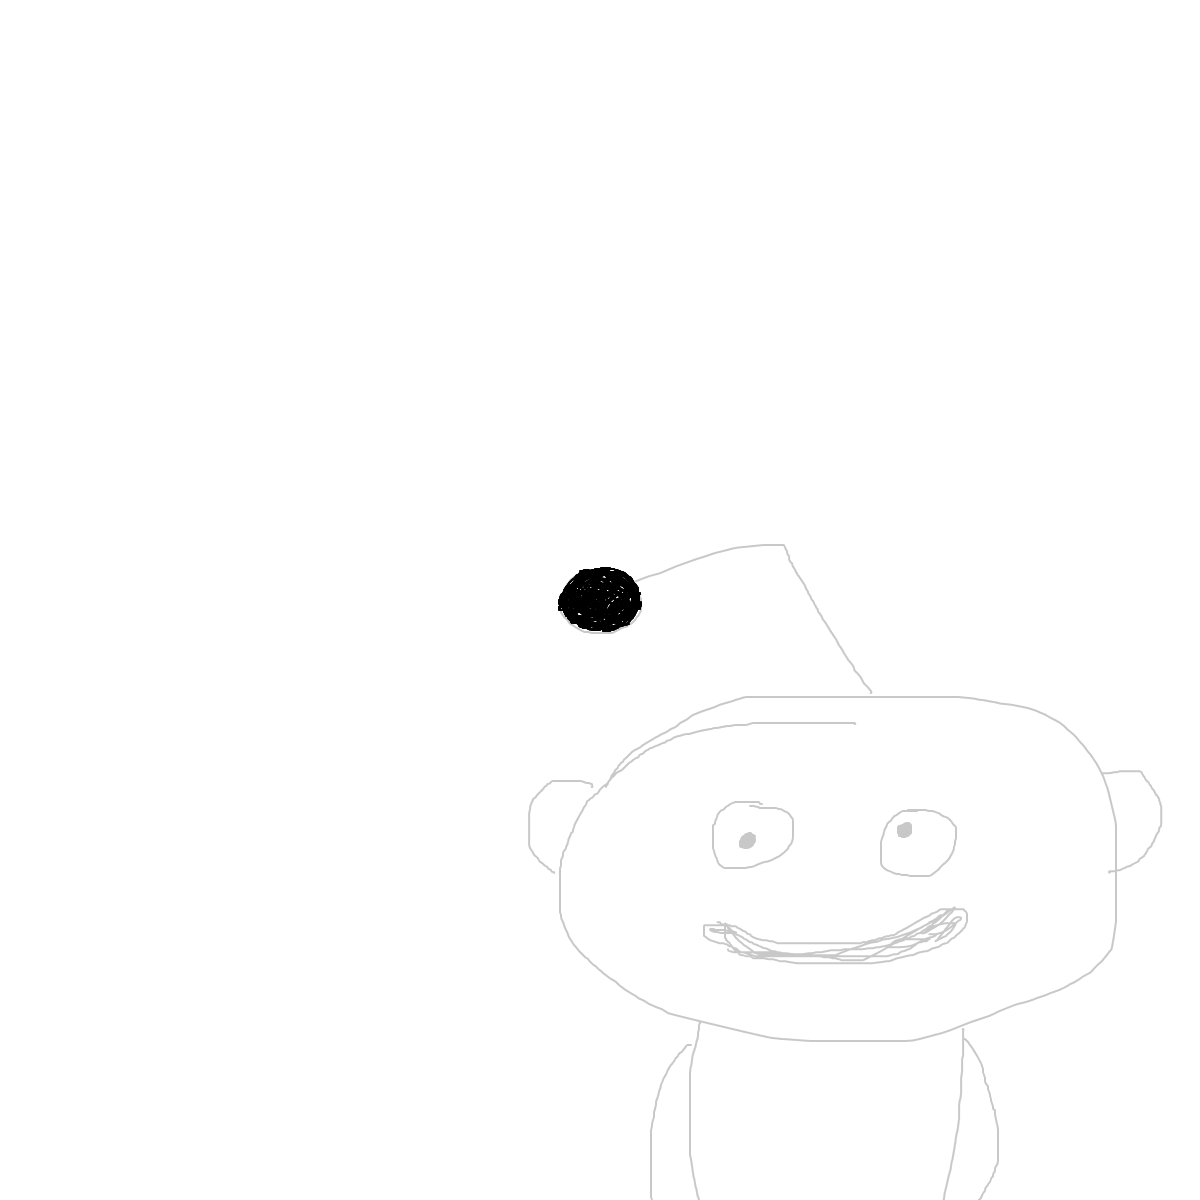 BAAAM drawing#9913 lat:52.4752197265625000lng: 13.4075260162353520